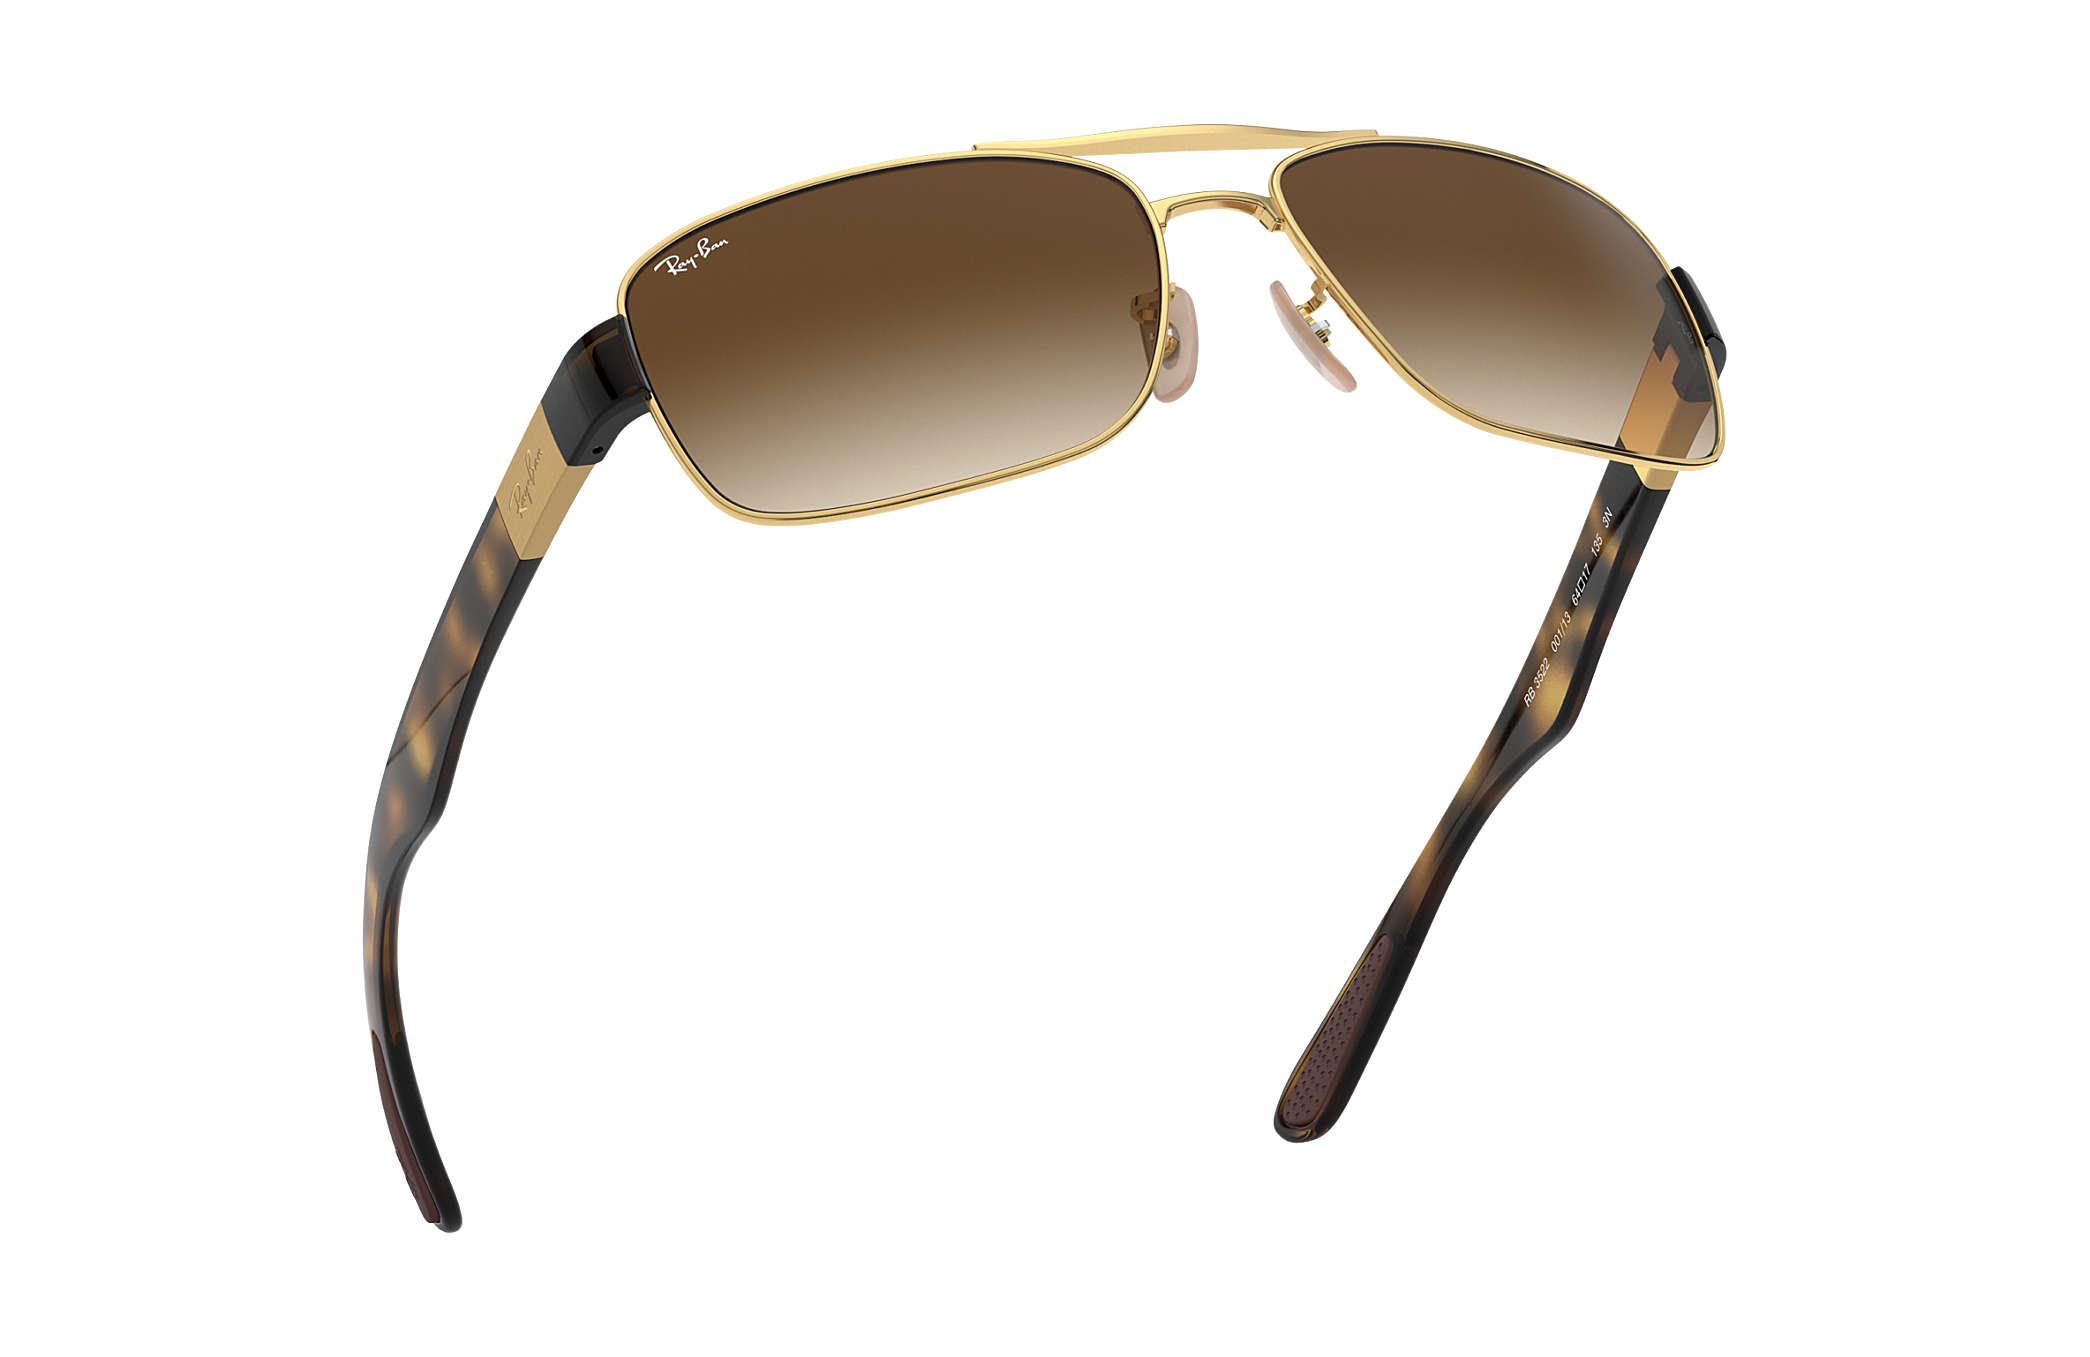 5b1e88792f Ray-Ban RB3522 Gold - Metal - Brown Lenses - 0RB3522001 1361